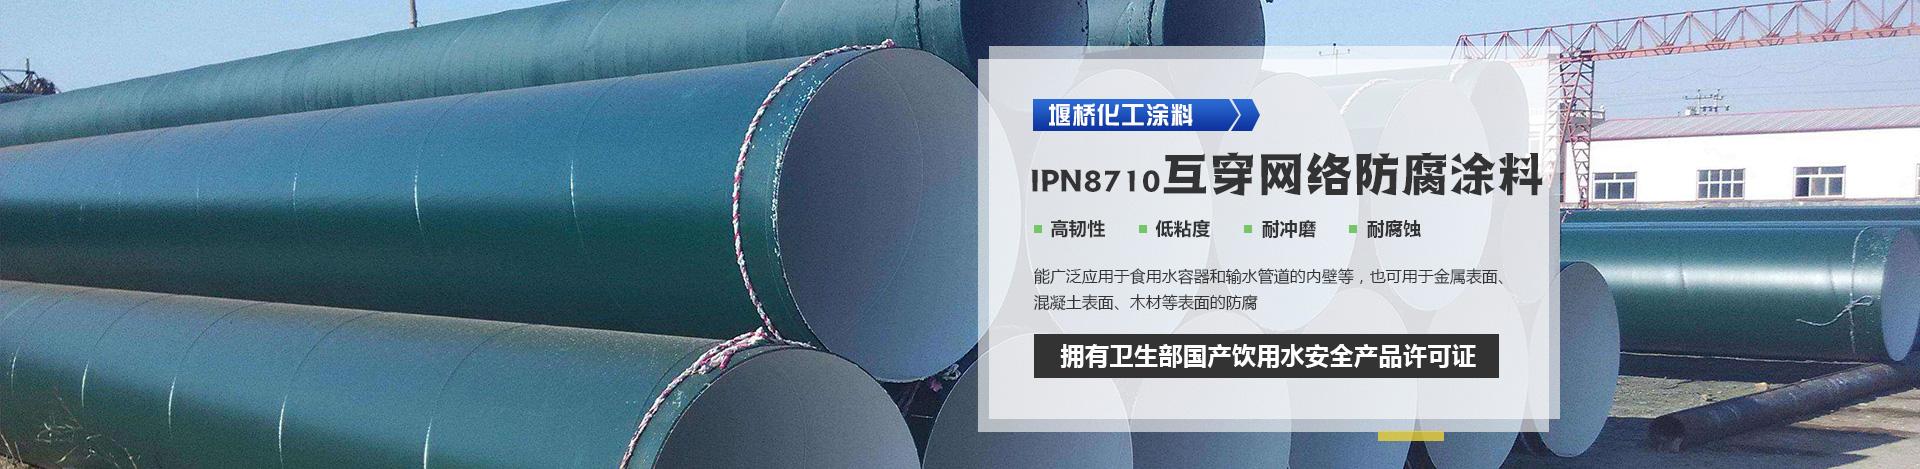 http://www.chinagstl.com/data/upload/202004/20200427085215_559.jpg